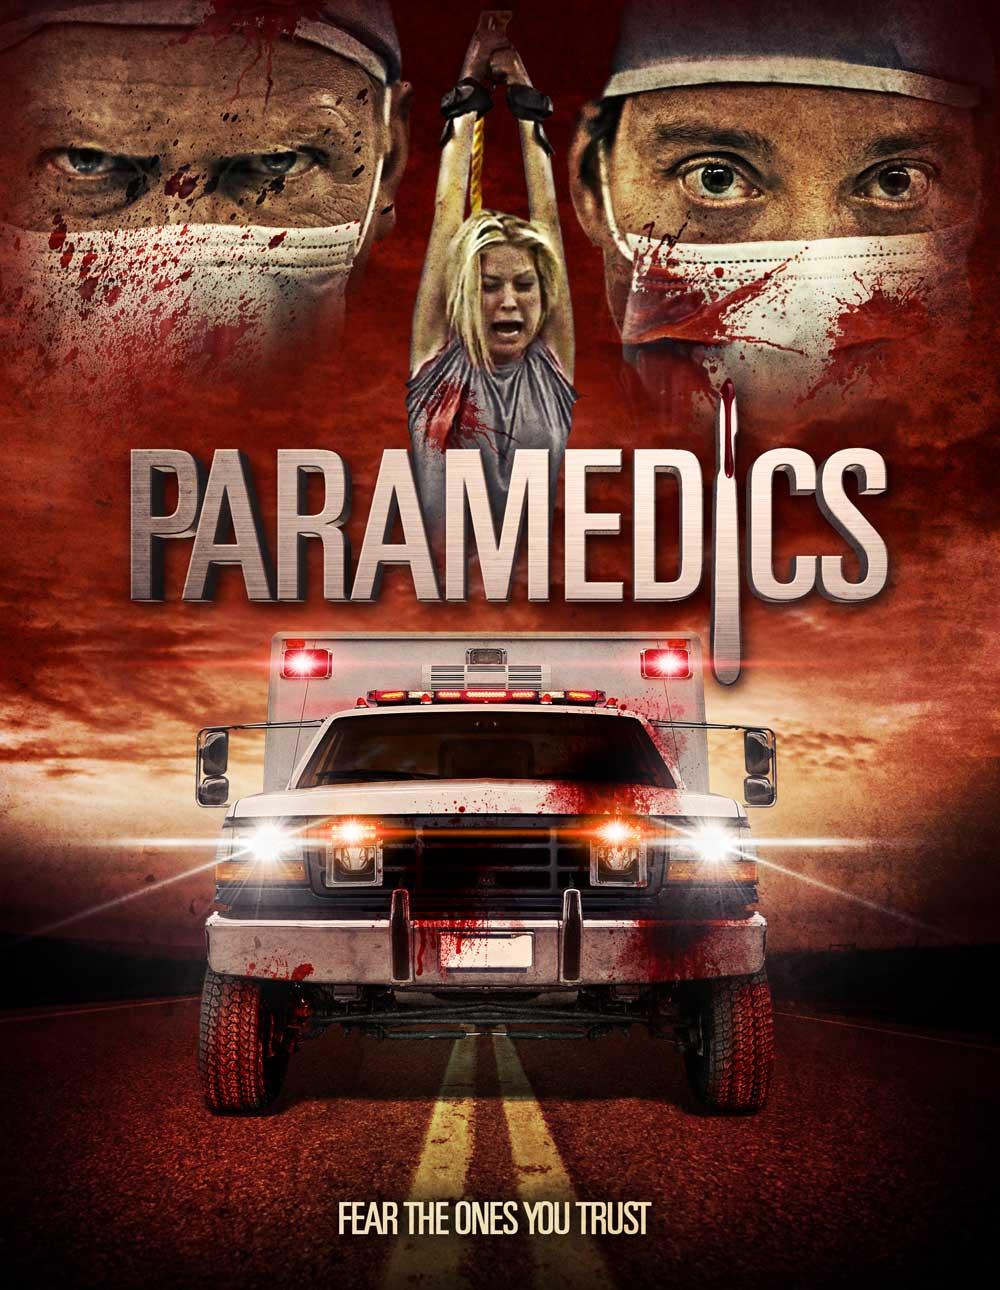 Paramedics-poster.jpg